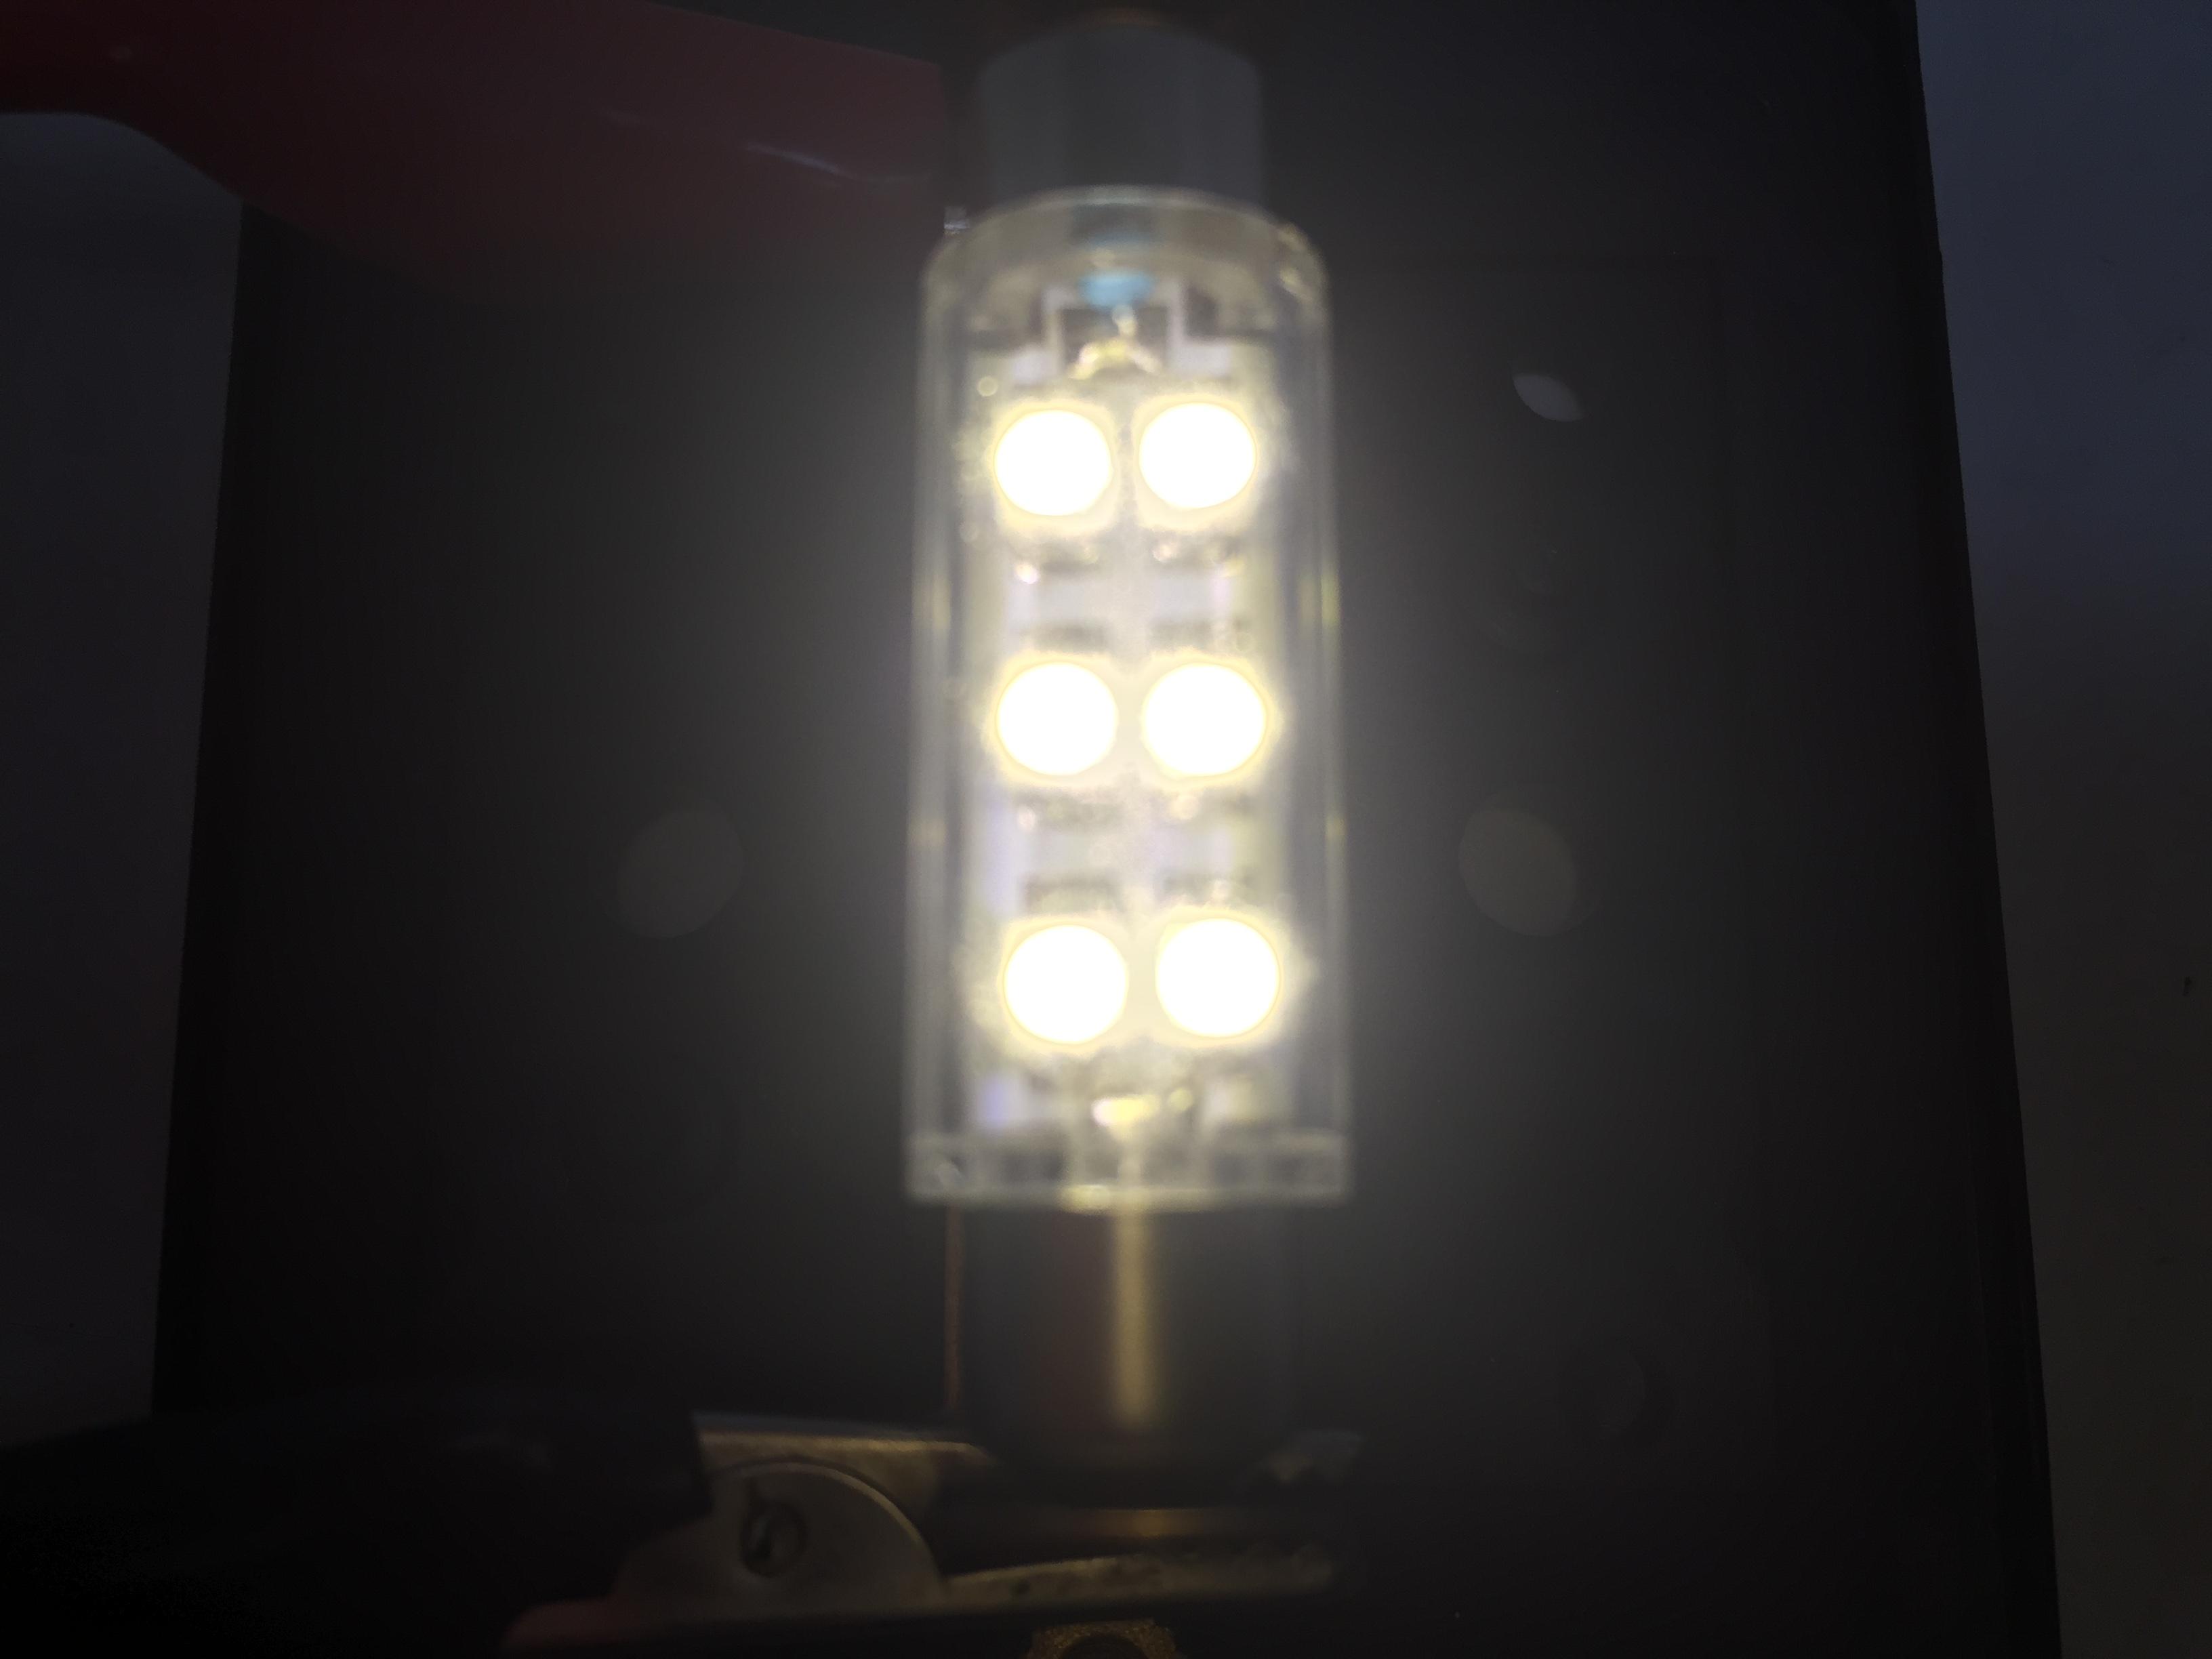 2 PCS MARINE AUTO RV TRAILER BUS VEHICLE LED BULB FESTOON TYPE WARM WHITE LIGHT